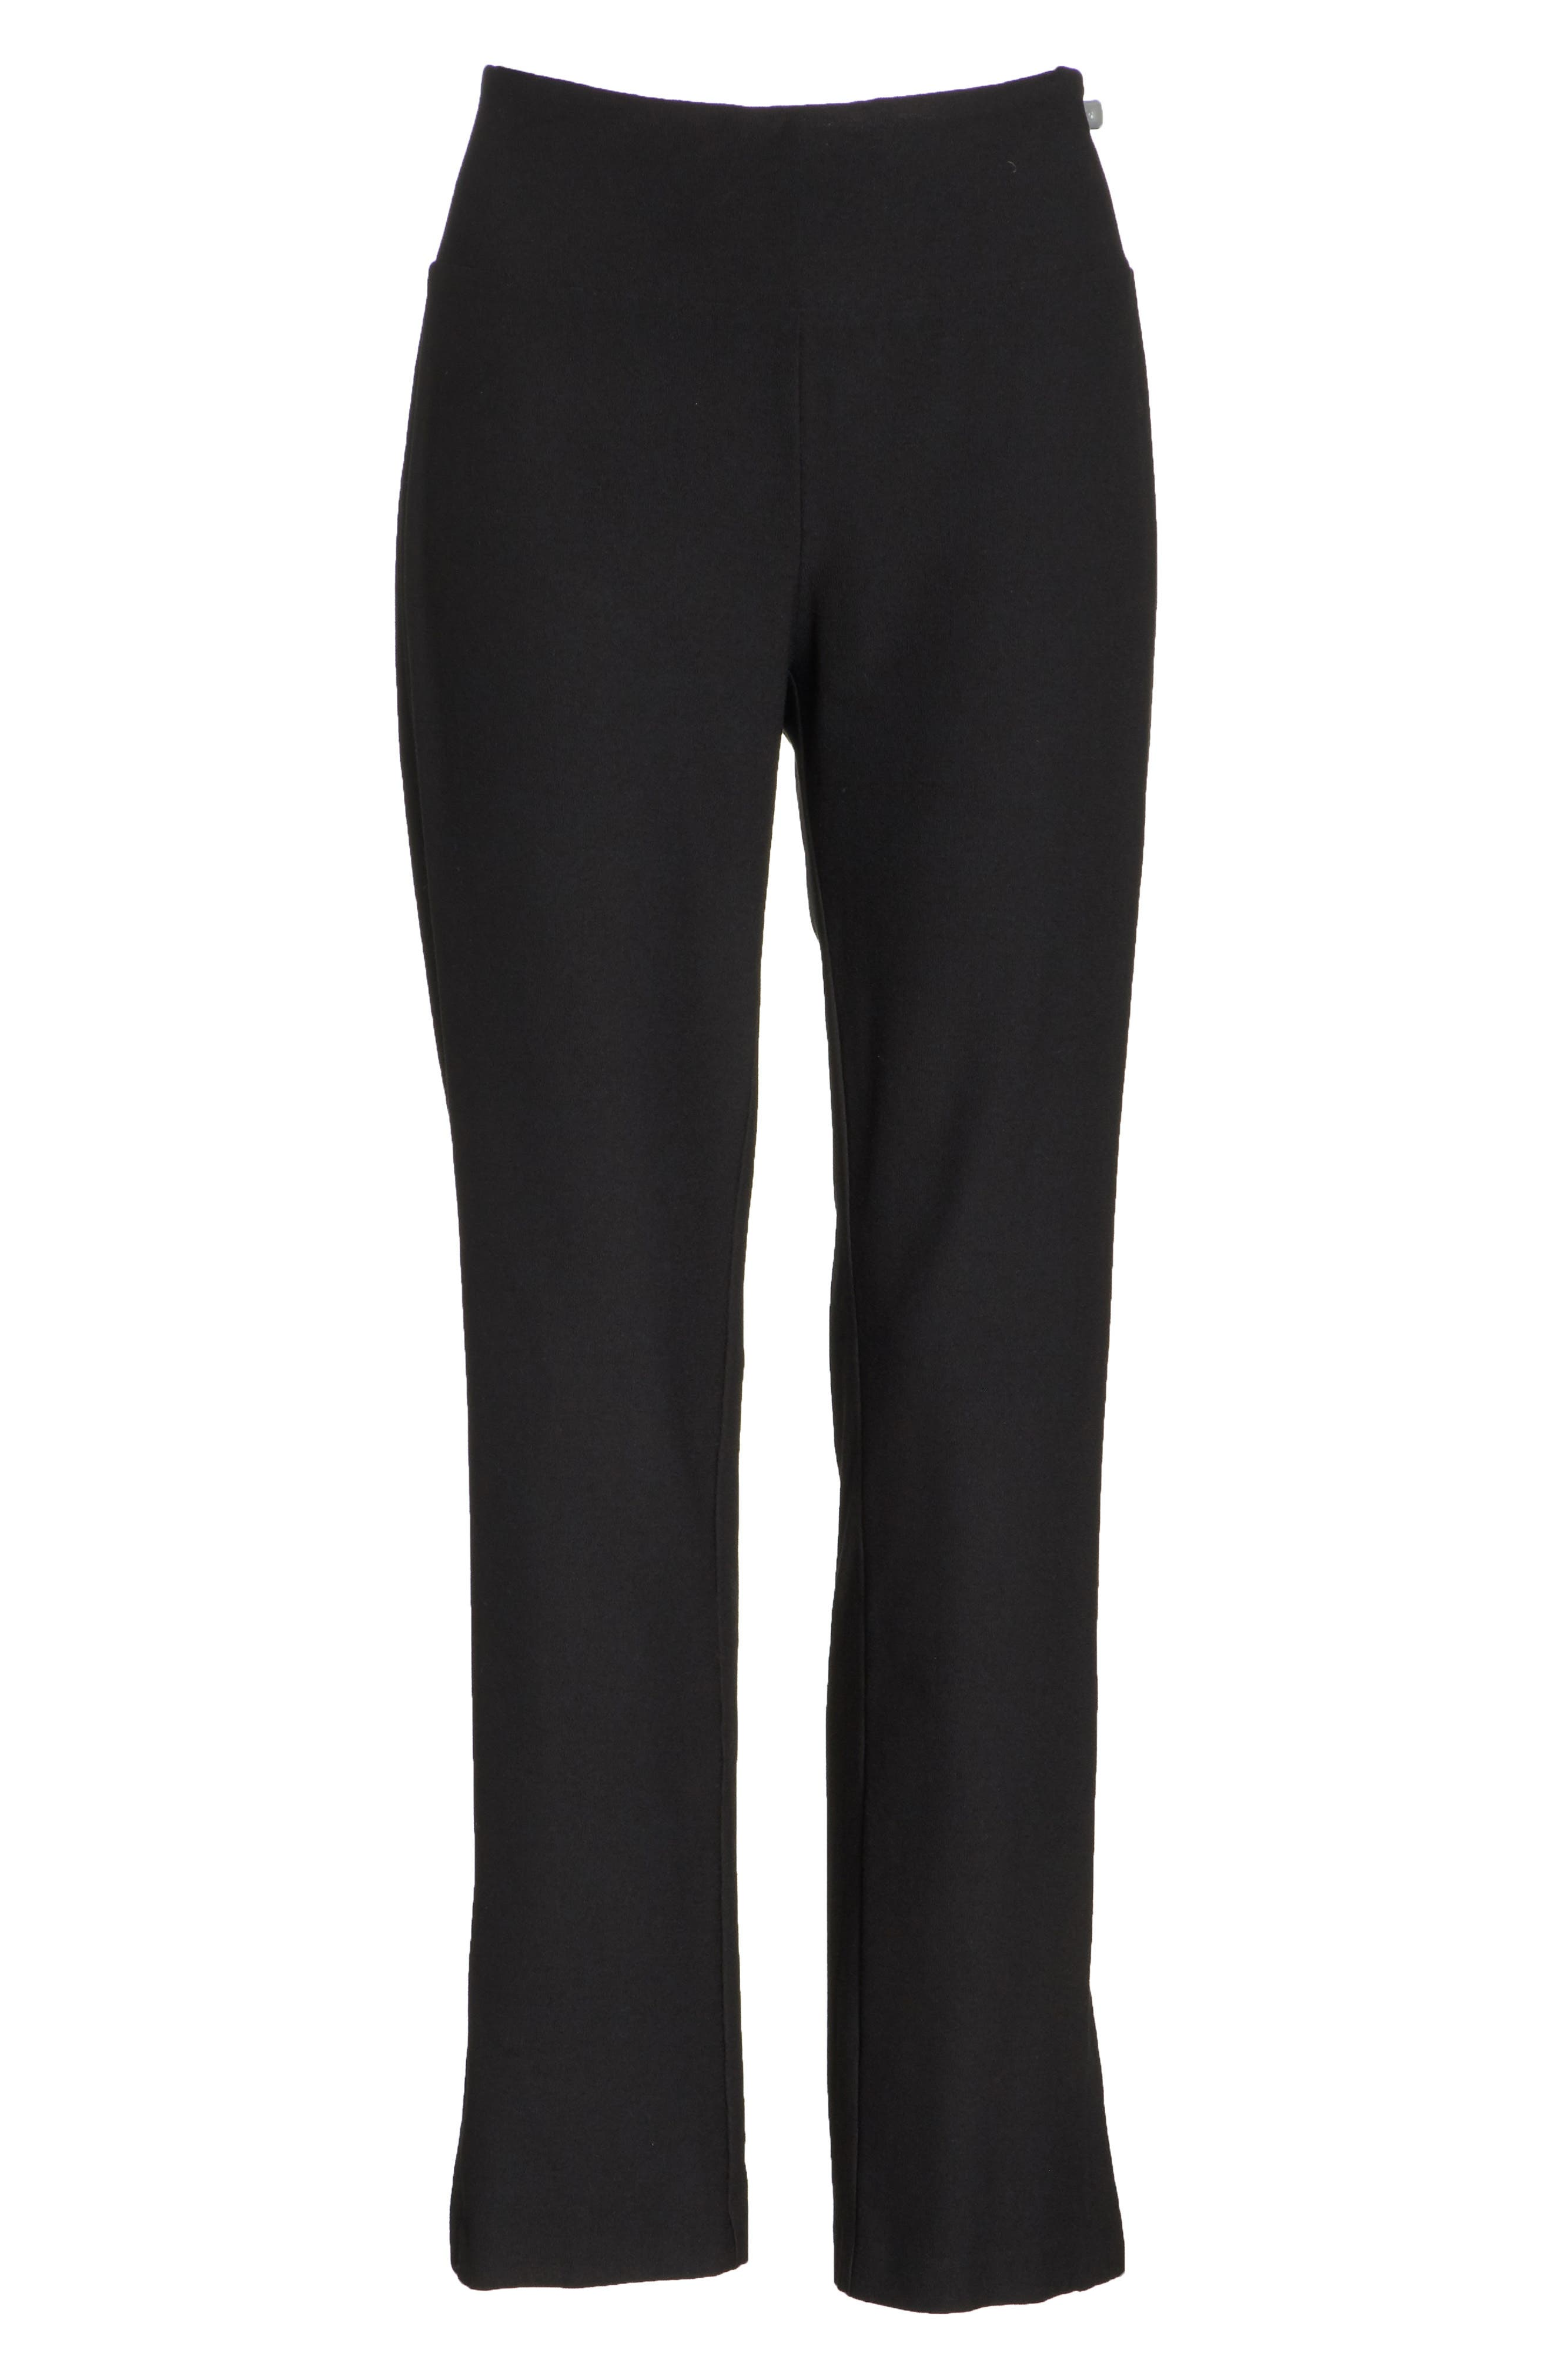 Slim Knit Pants,                             Alternate thumbnail 6, color,                             001